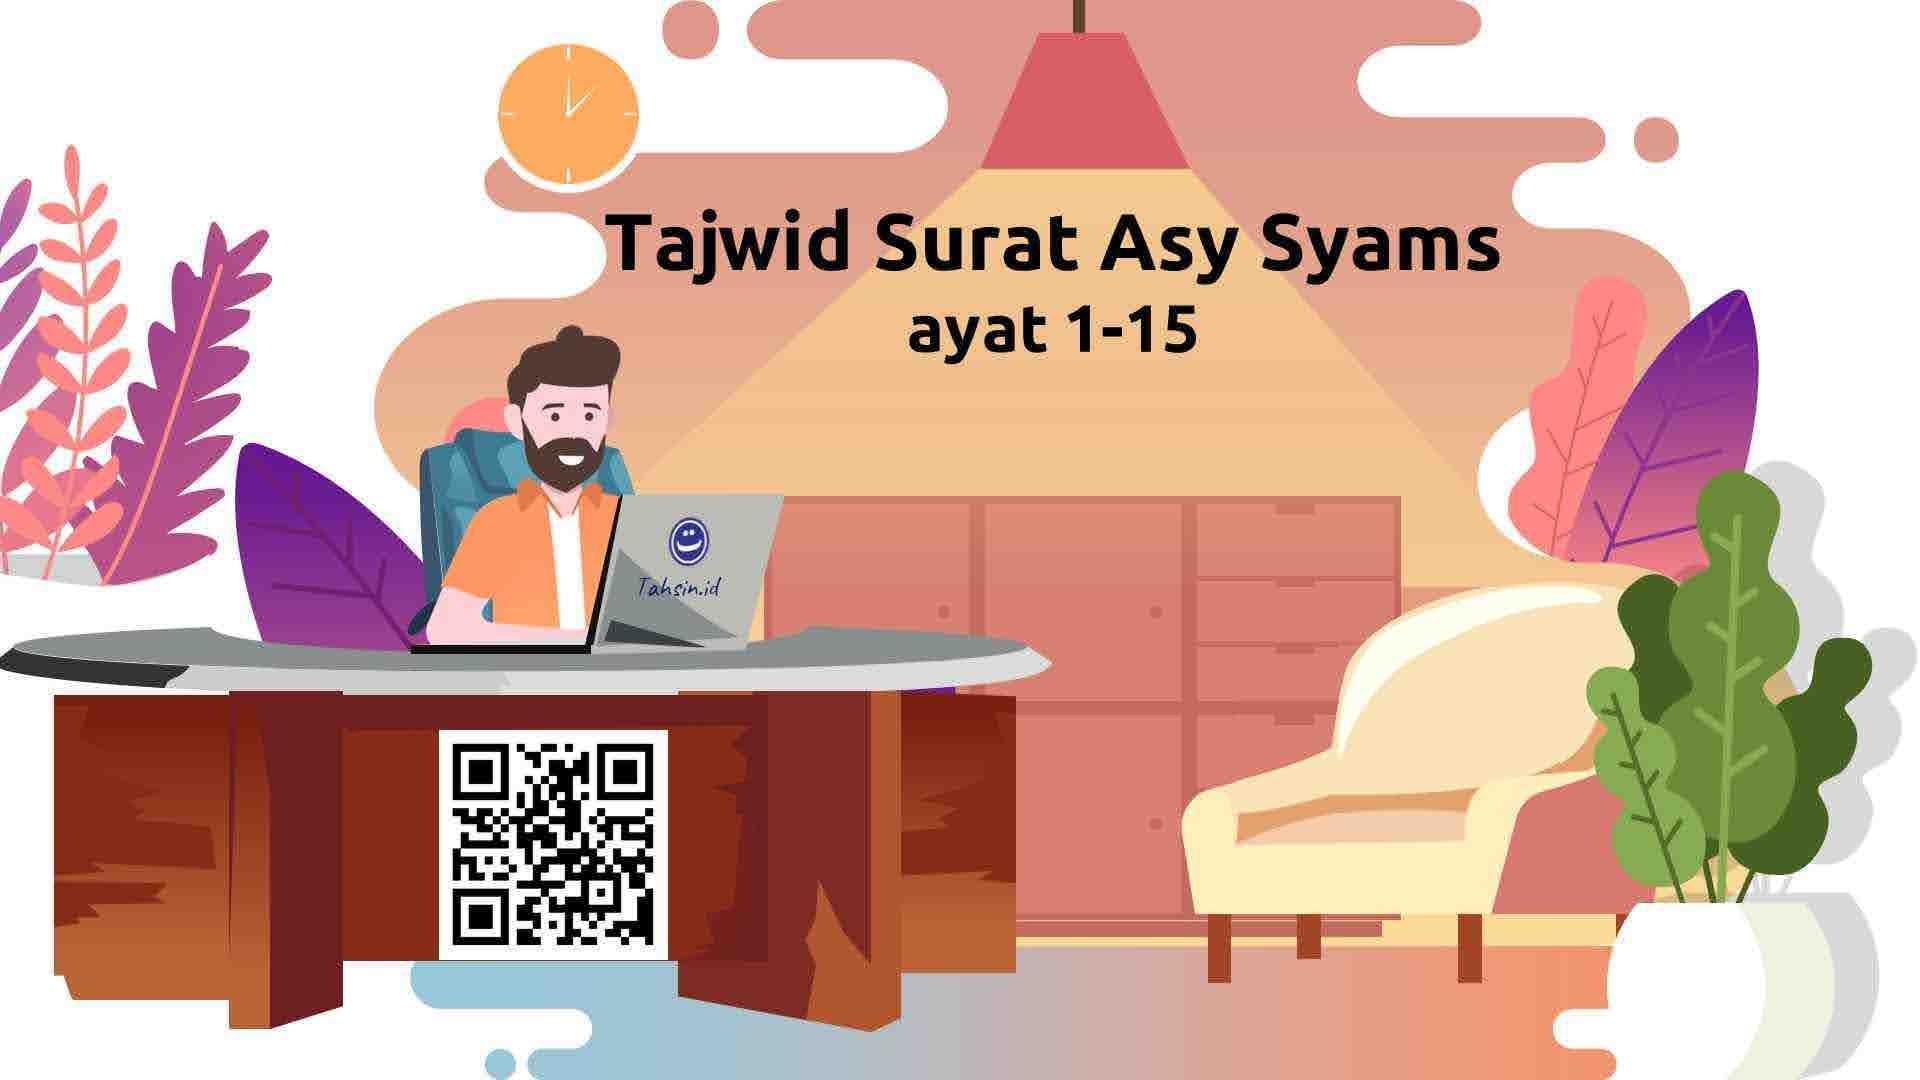 tajwid-surat-asy-syams